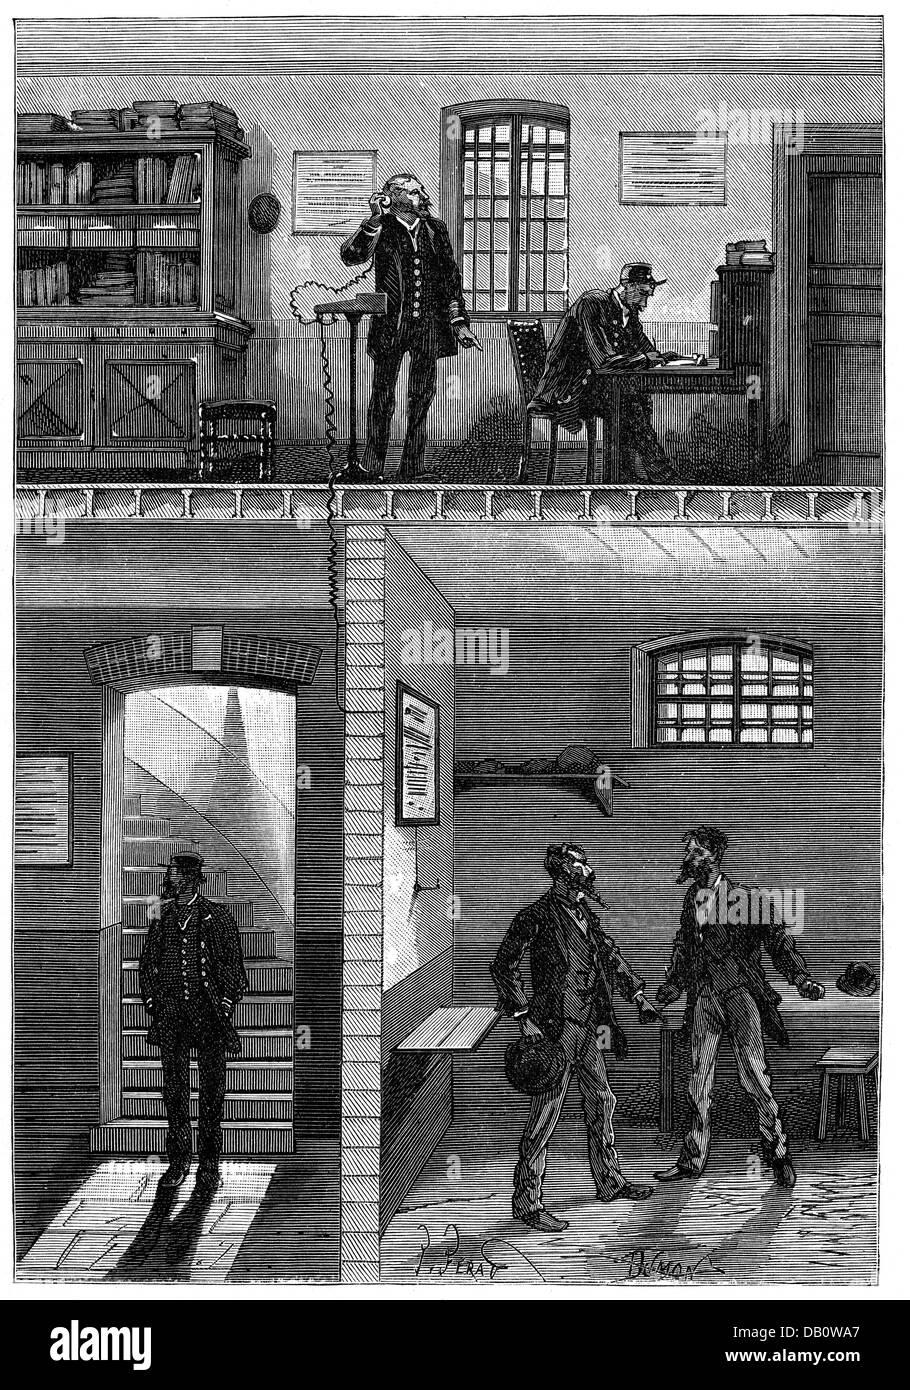 New York Prison Stock Photos & New York Prison Stock Images - Alamy